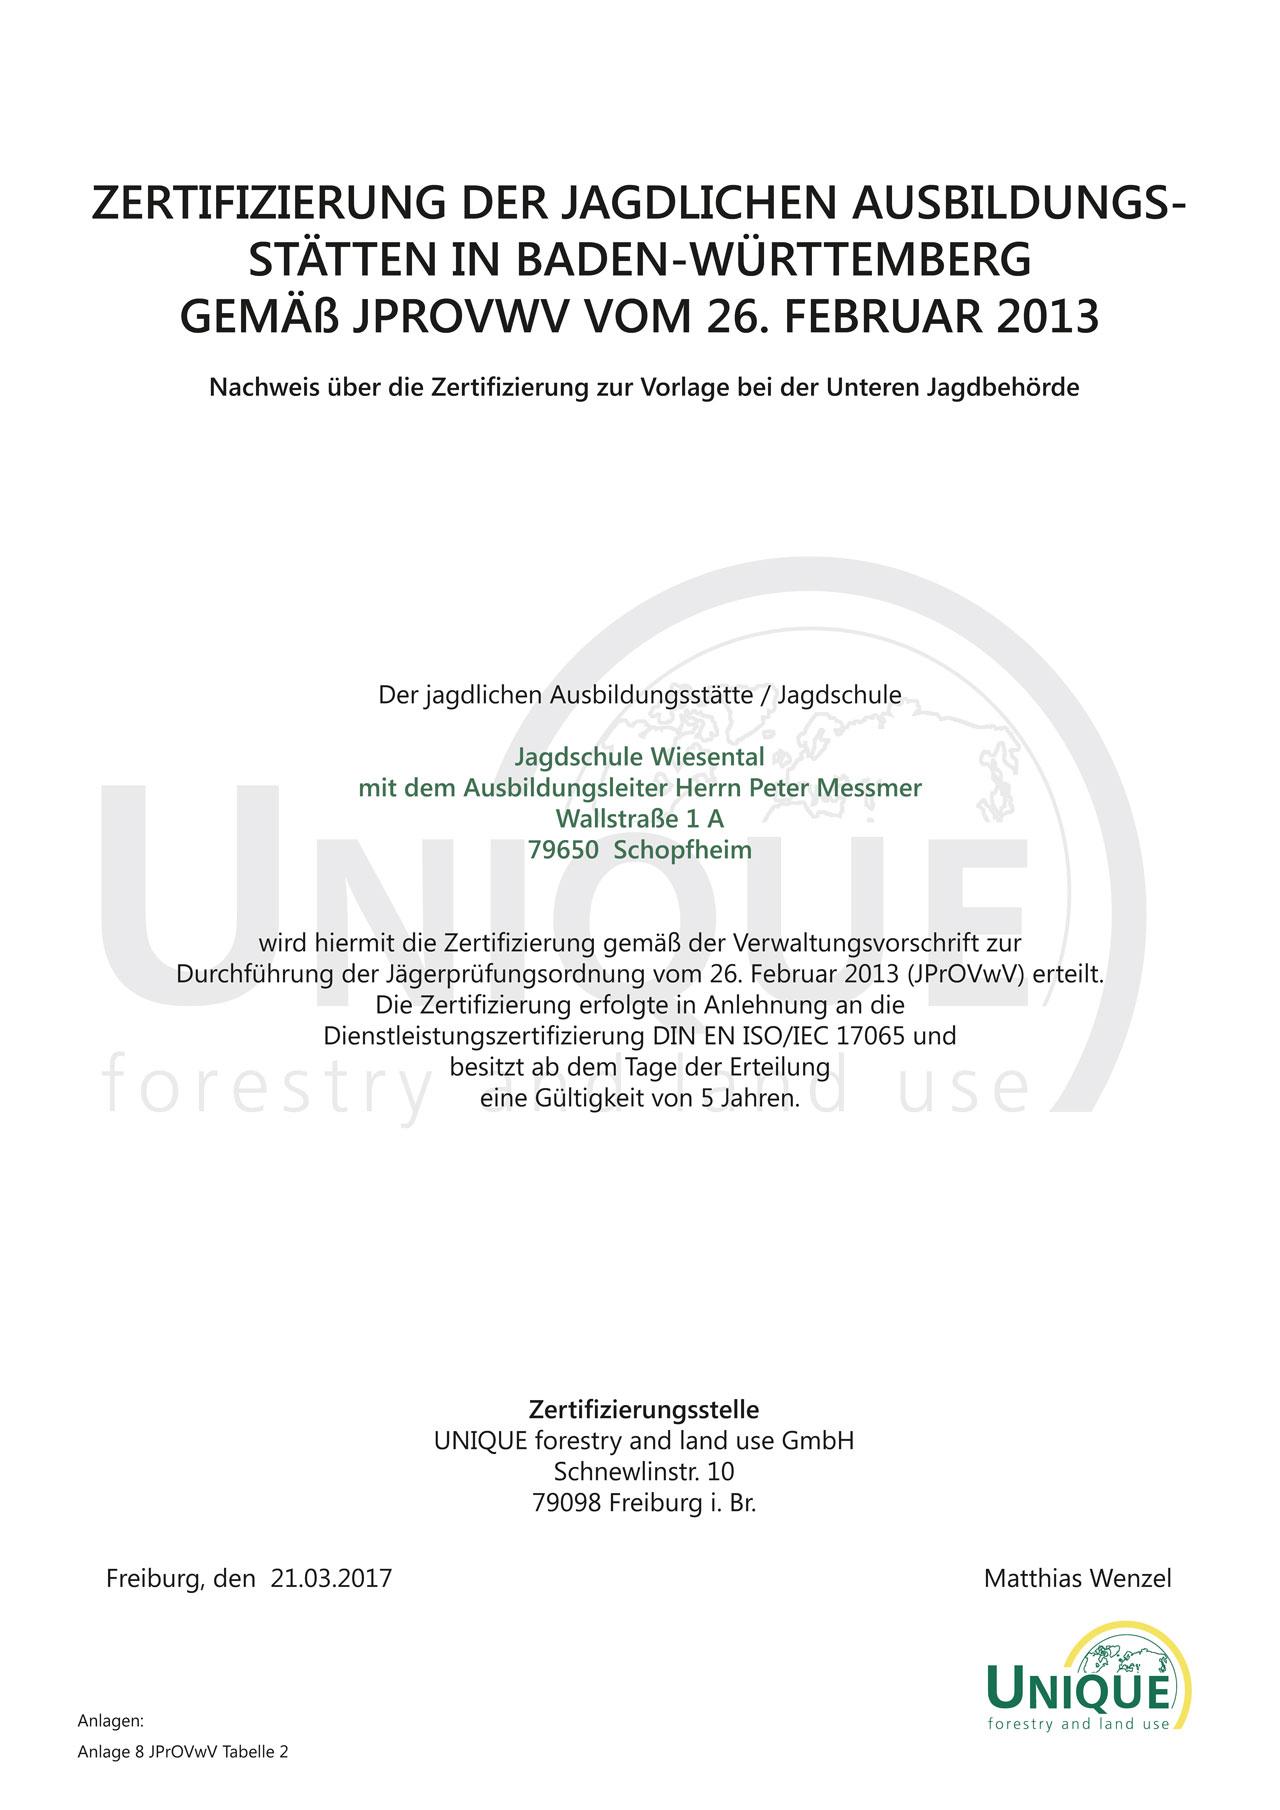 Zertifizierung der jagdlichen Ausbildungsstätte/ Jagdschule ...